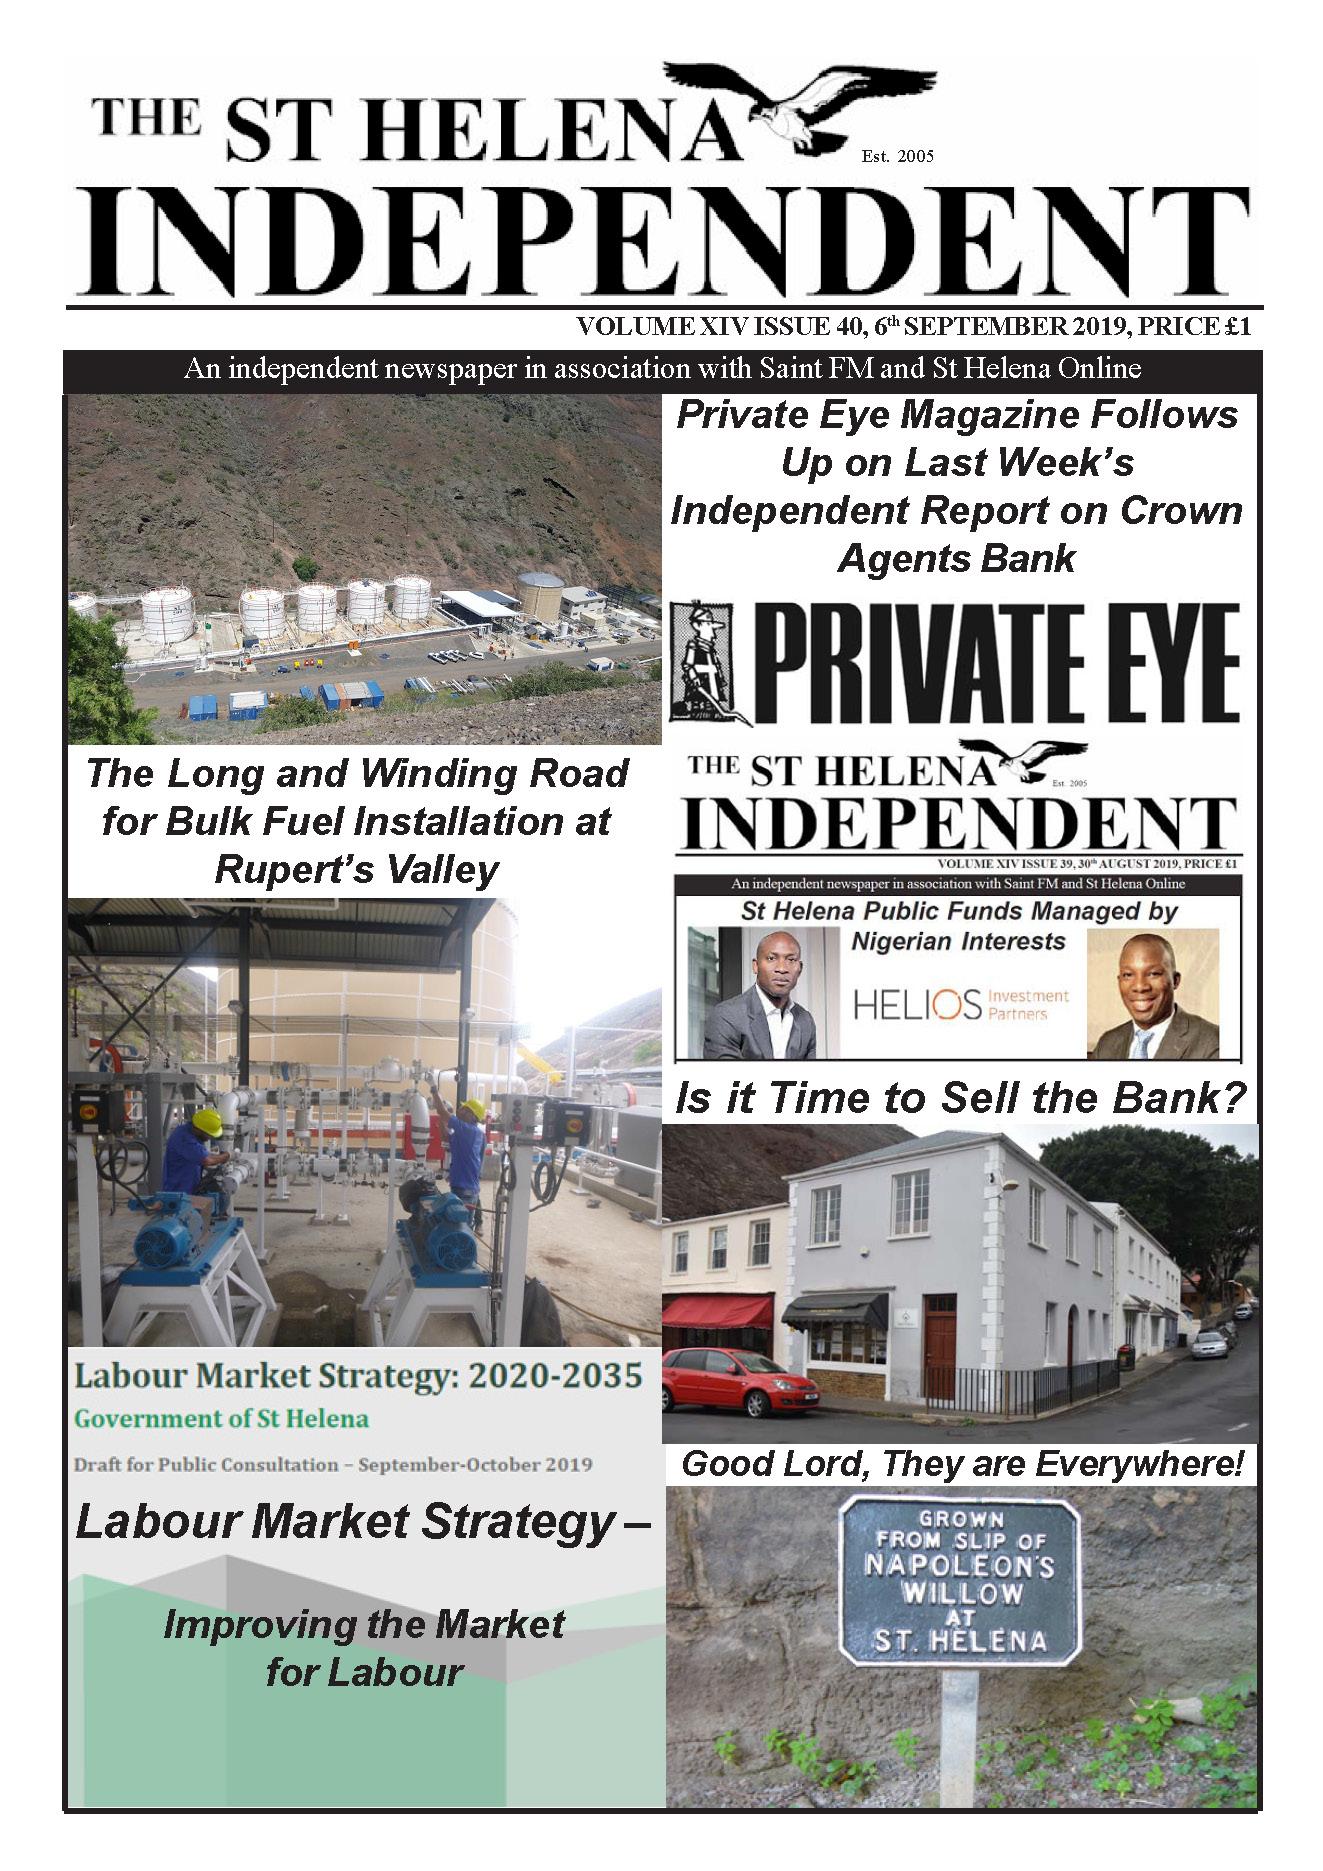 St Helena Independent 20190906